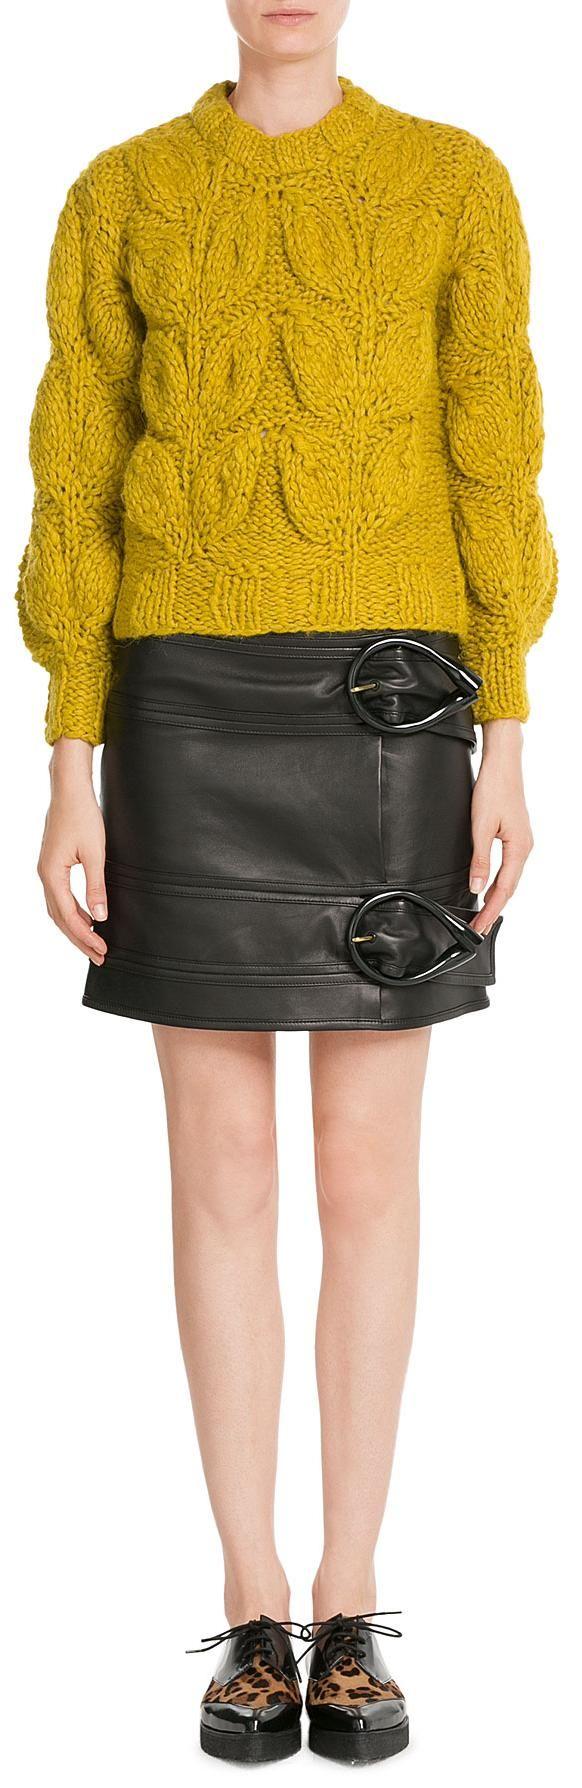 Maison Margiela Chunky Knit Pullover